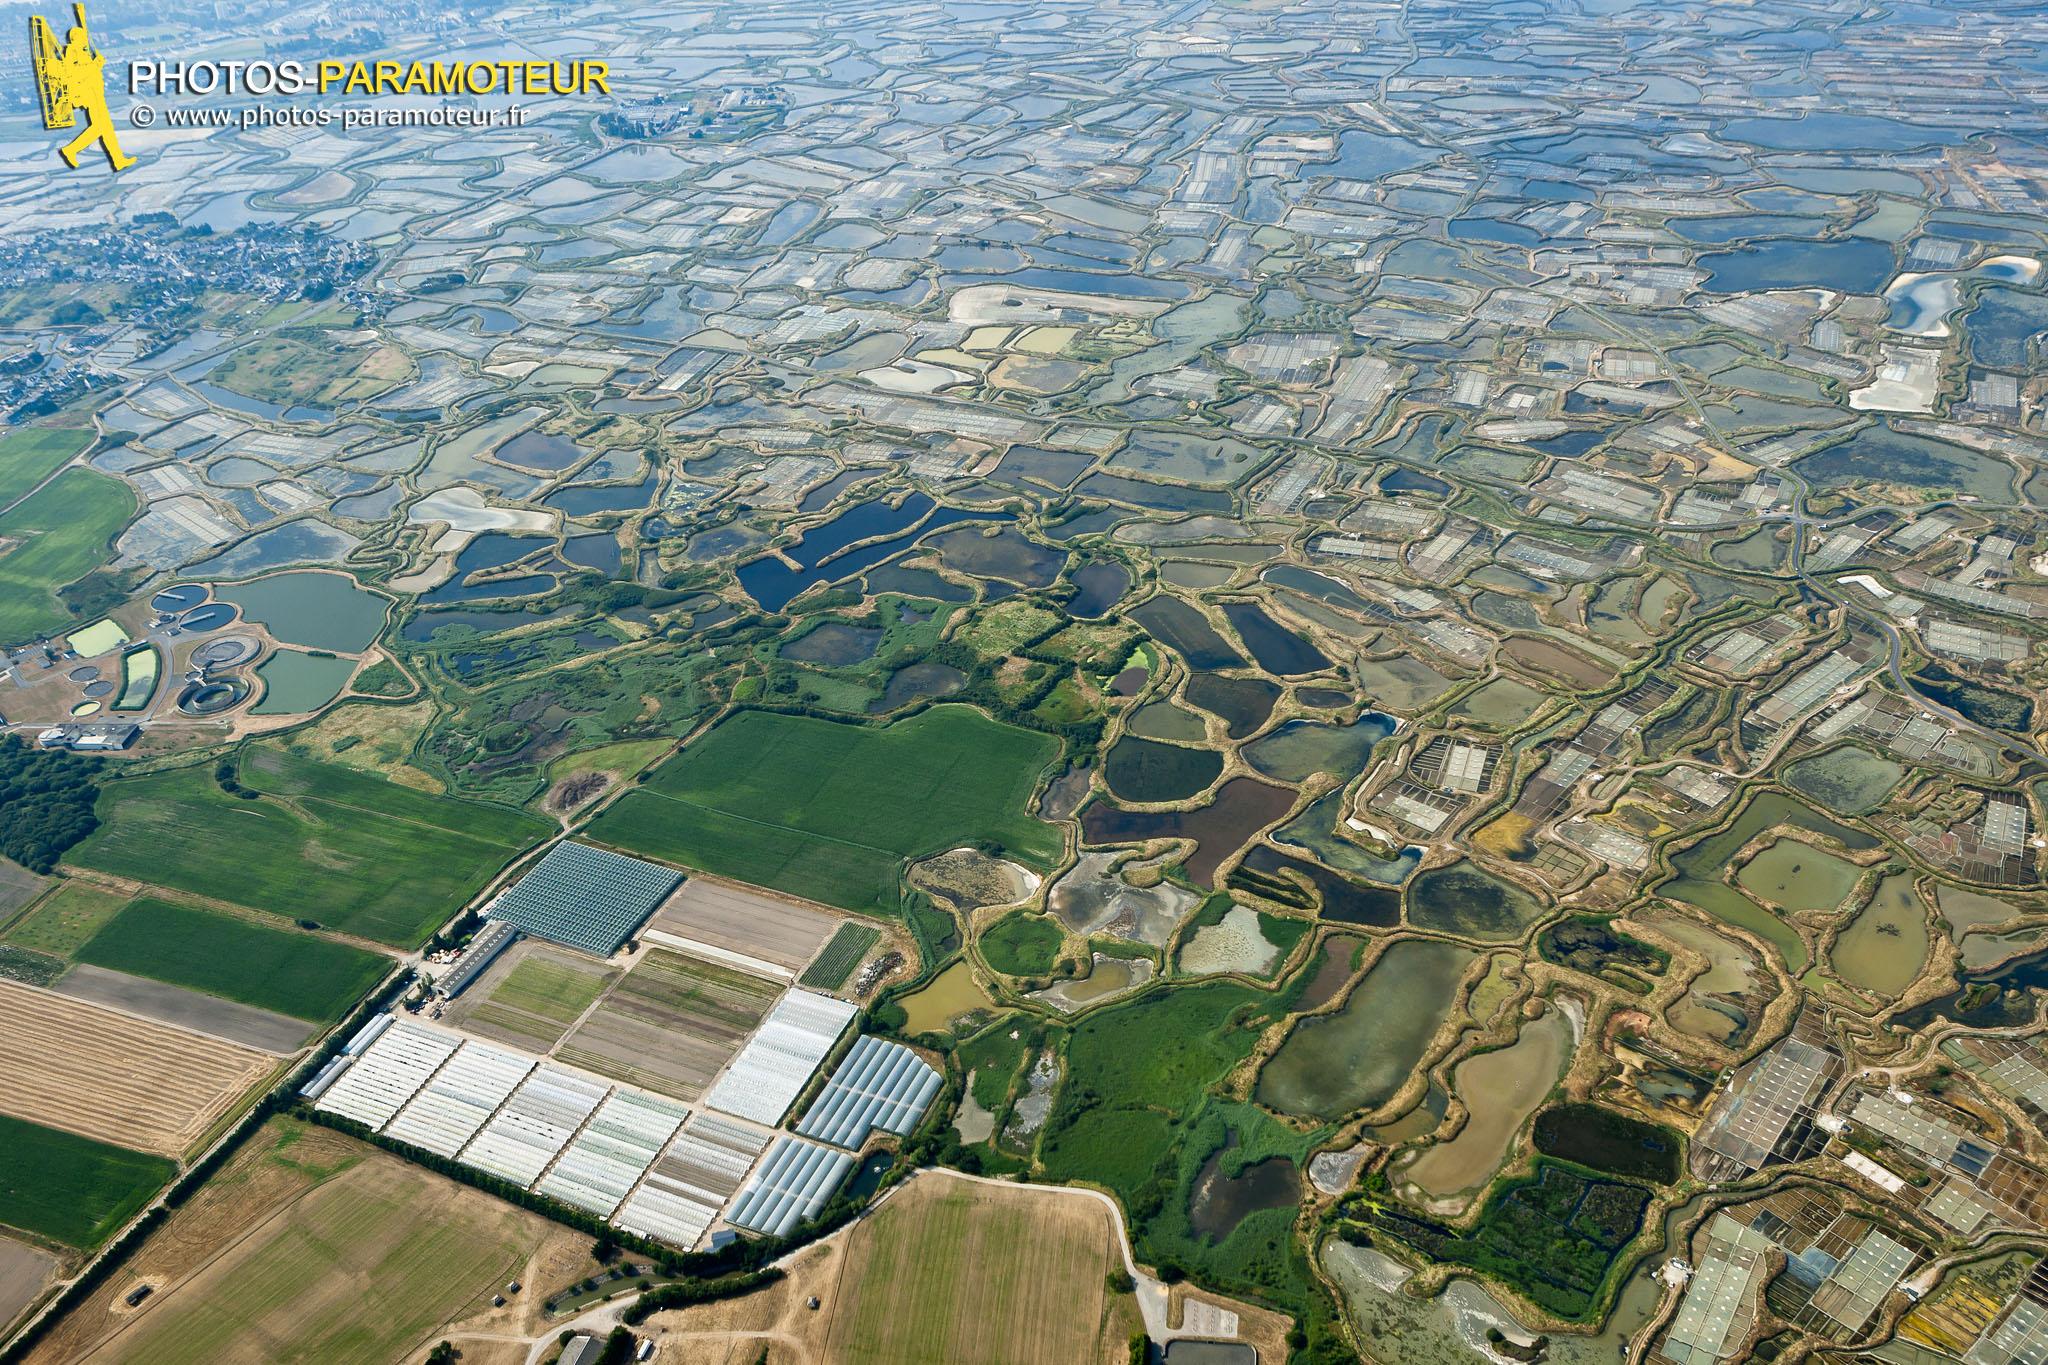 Marais salants de Guérande vue du ciel